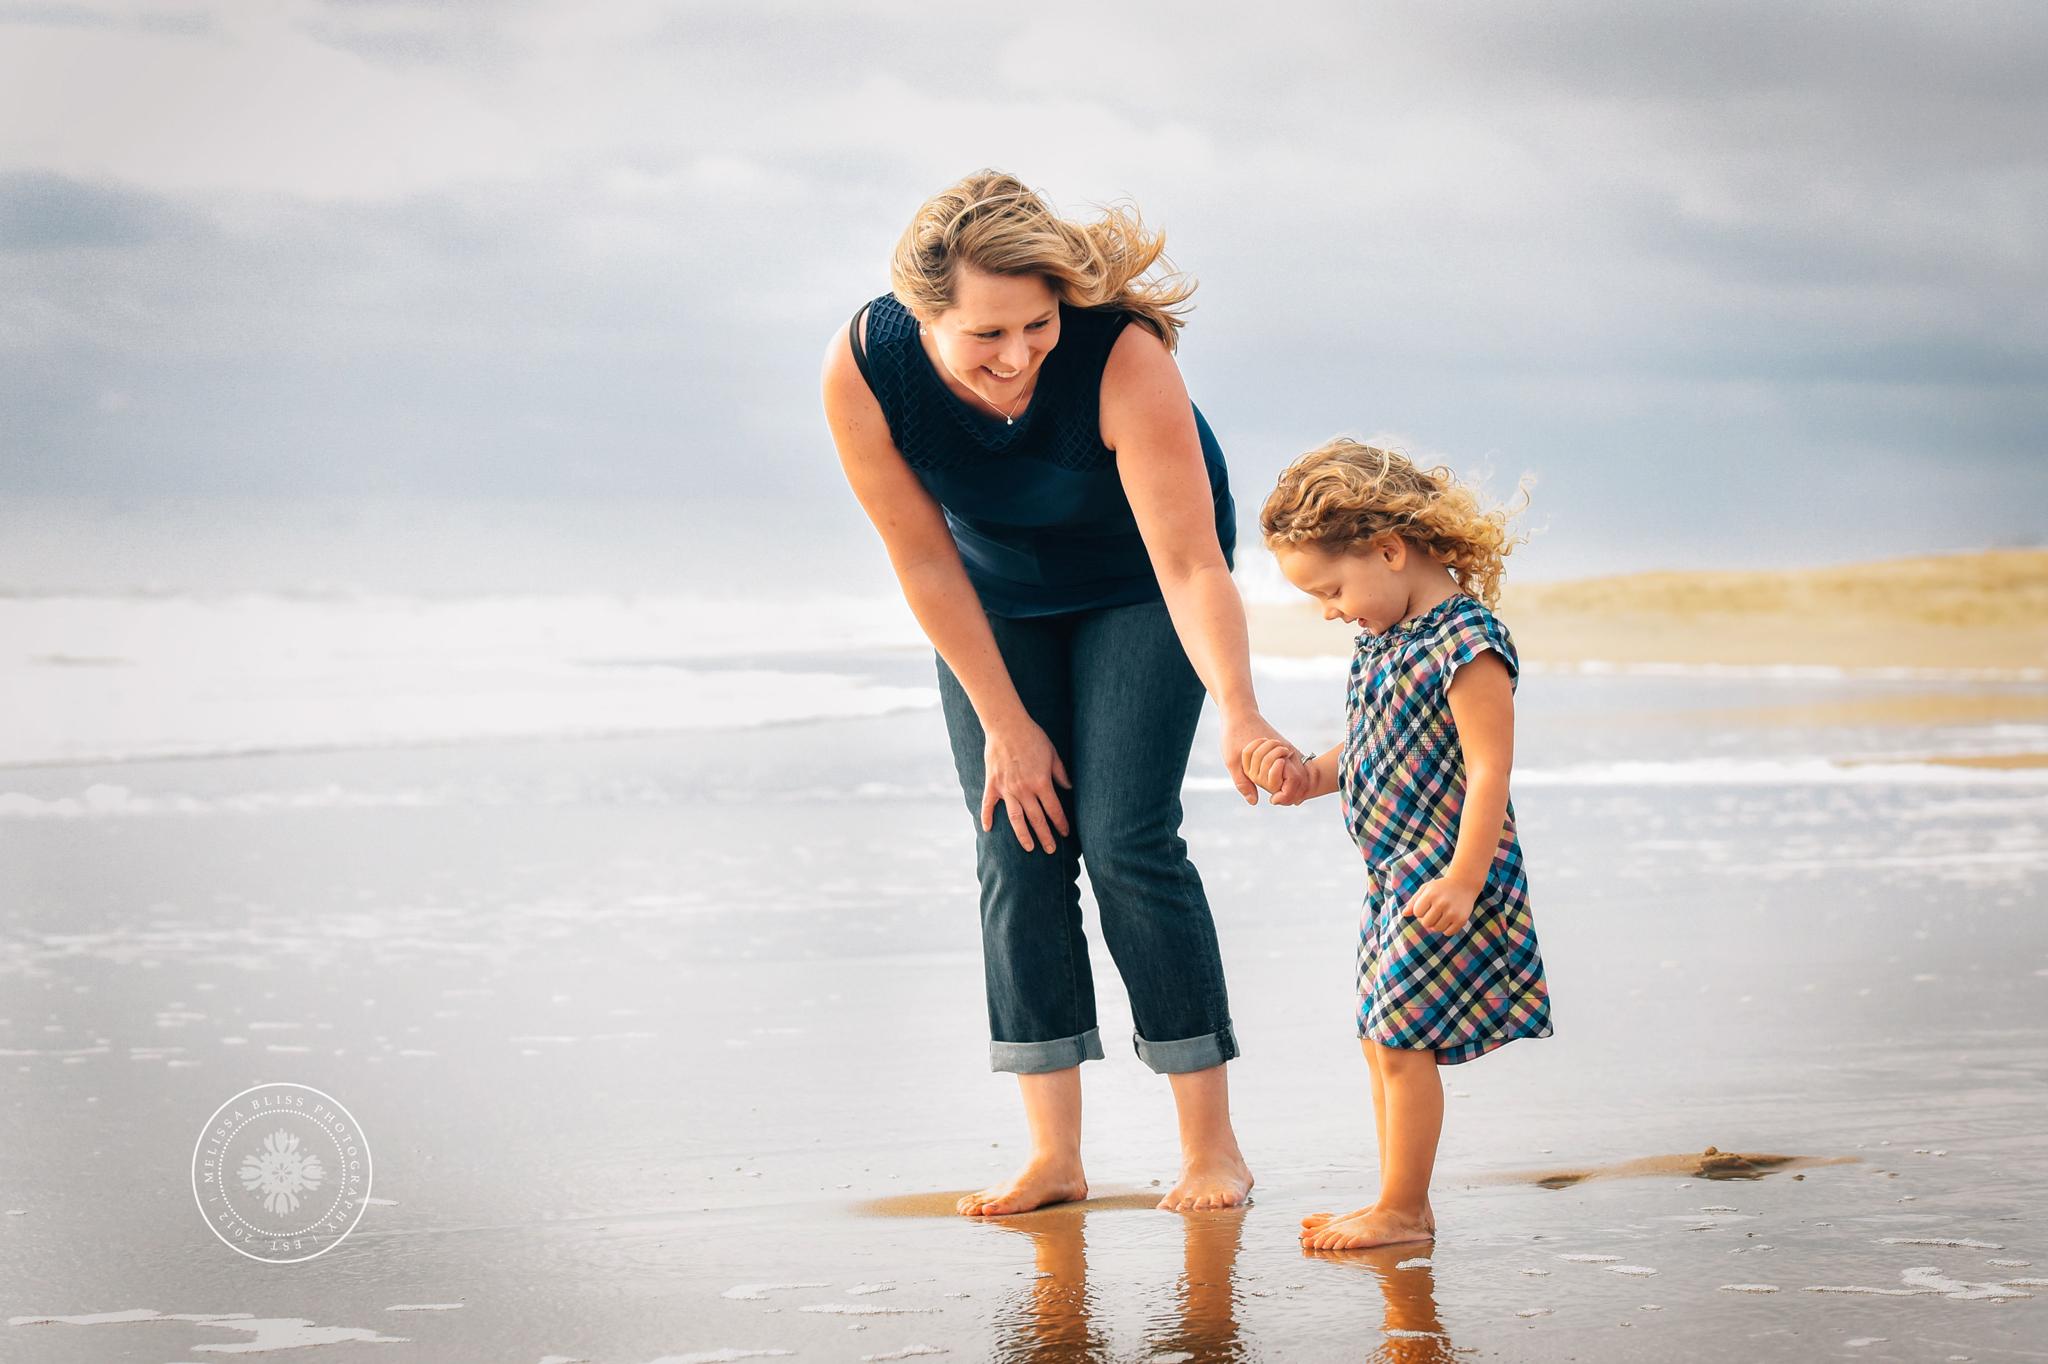 virginia-beach-lifestyle-photographers-melissa-bliss-photography-candid-fun-family-photos-norfolk-chesapeake-suffolk